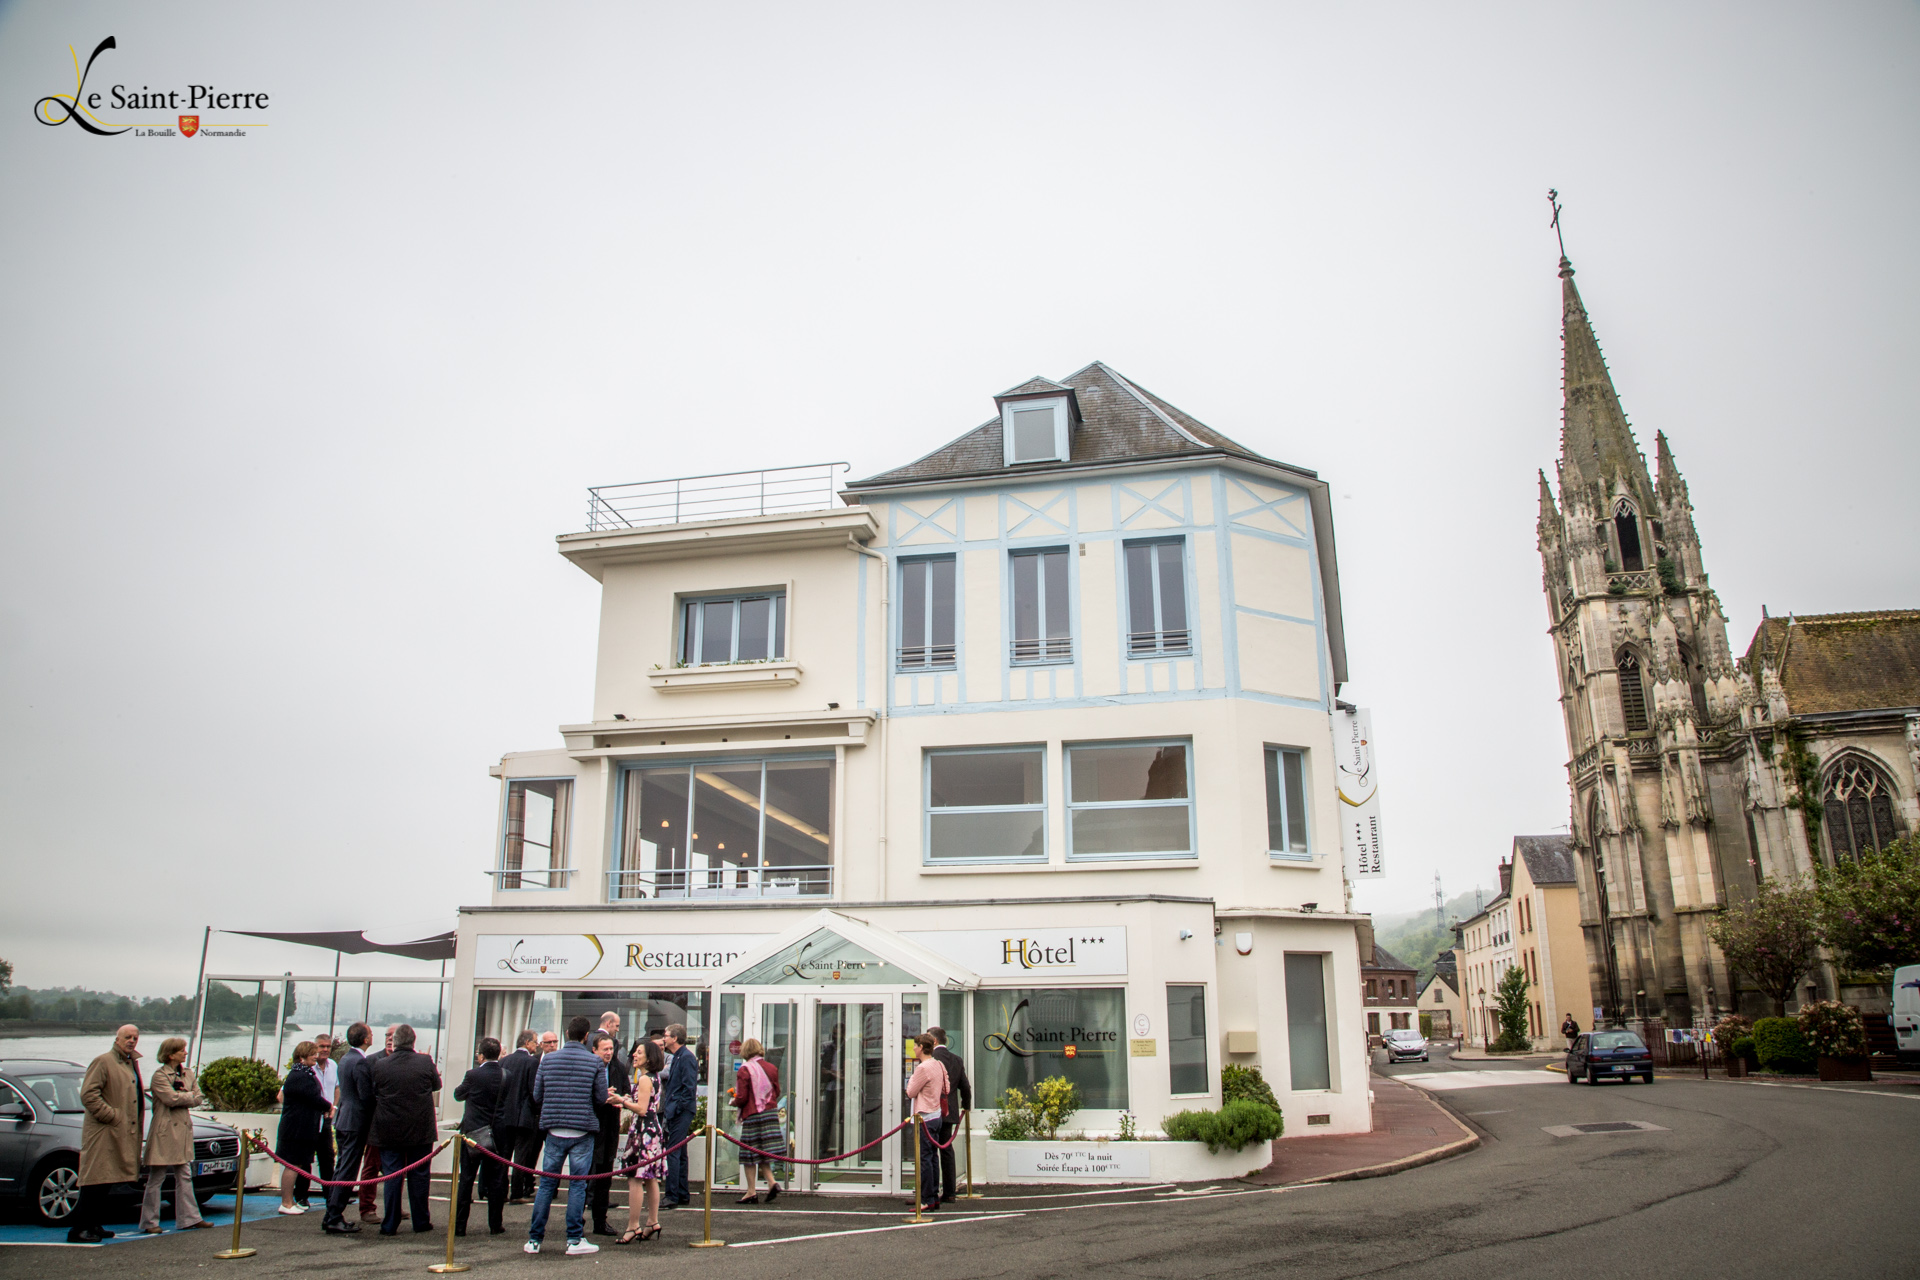 1500-inauguration du Saint Pierre 11 mai 2016-5D3H3574